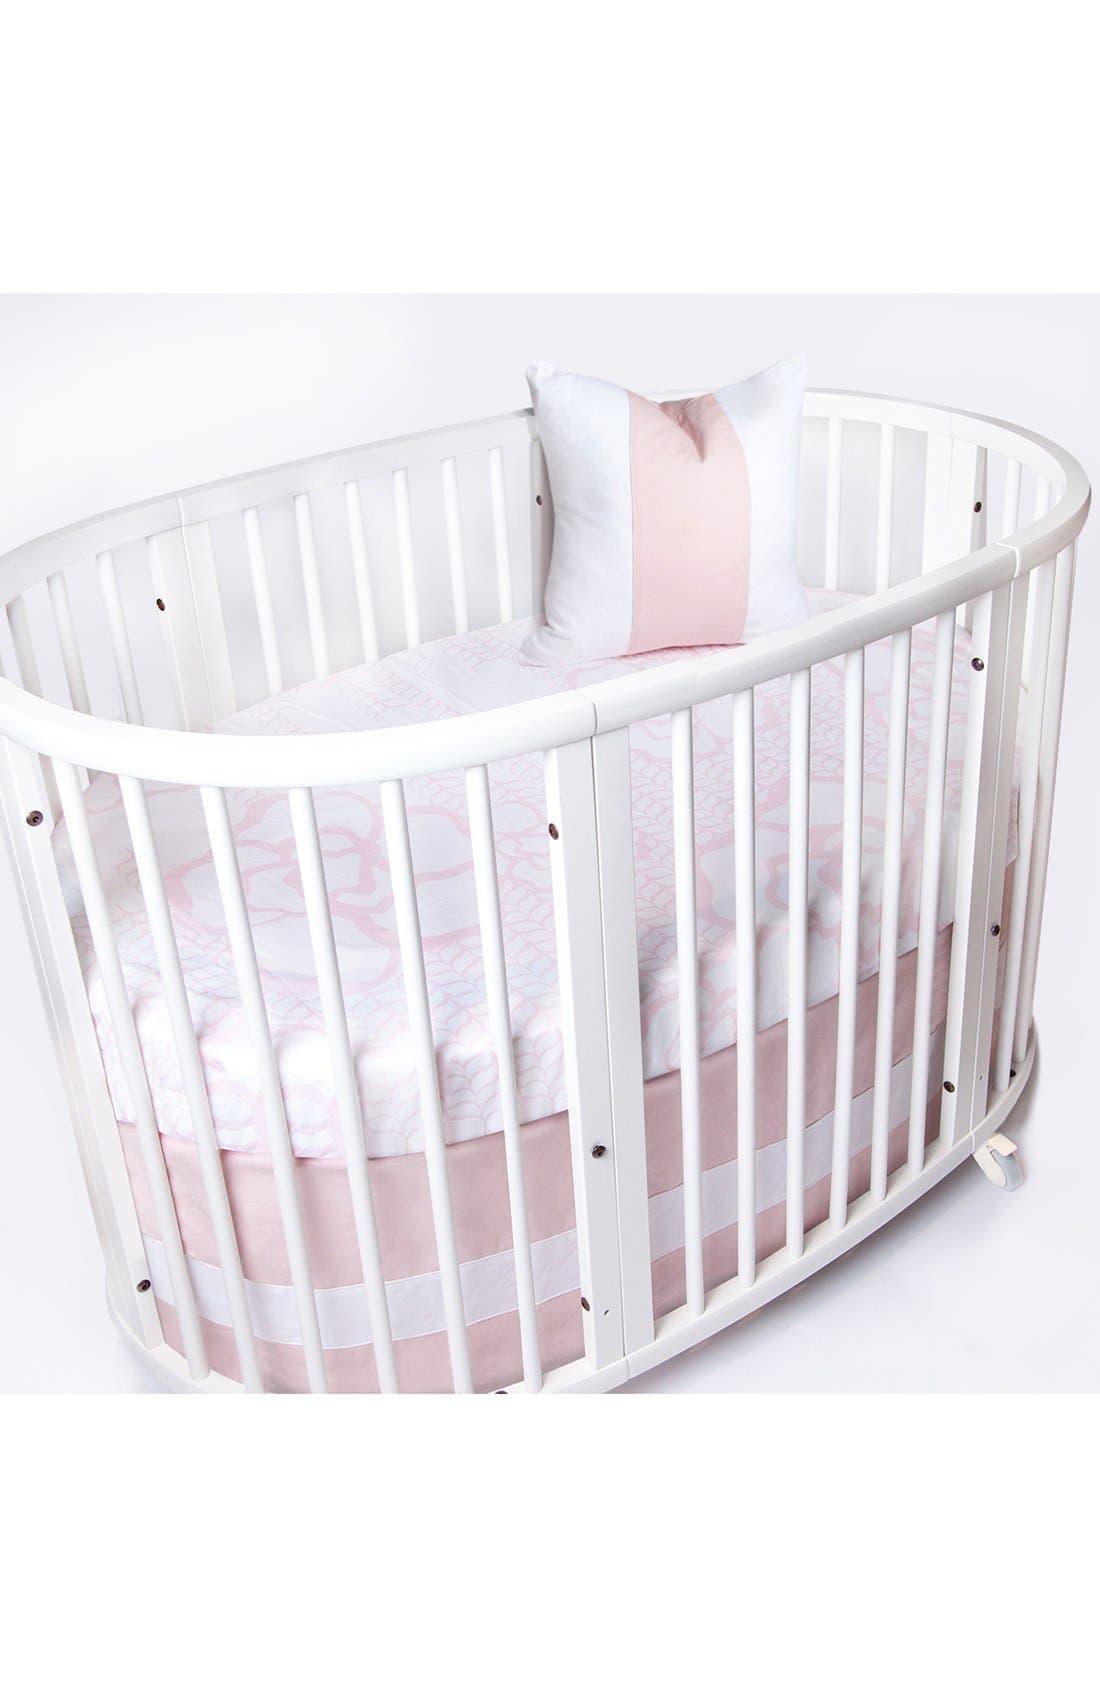 Woven Band Crib Skirt for Stokke Sleepi Crib,                         Main,                         color, Blush W/ White Band